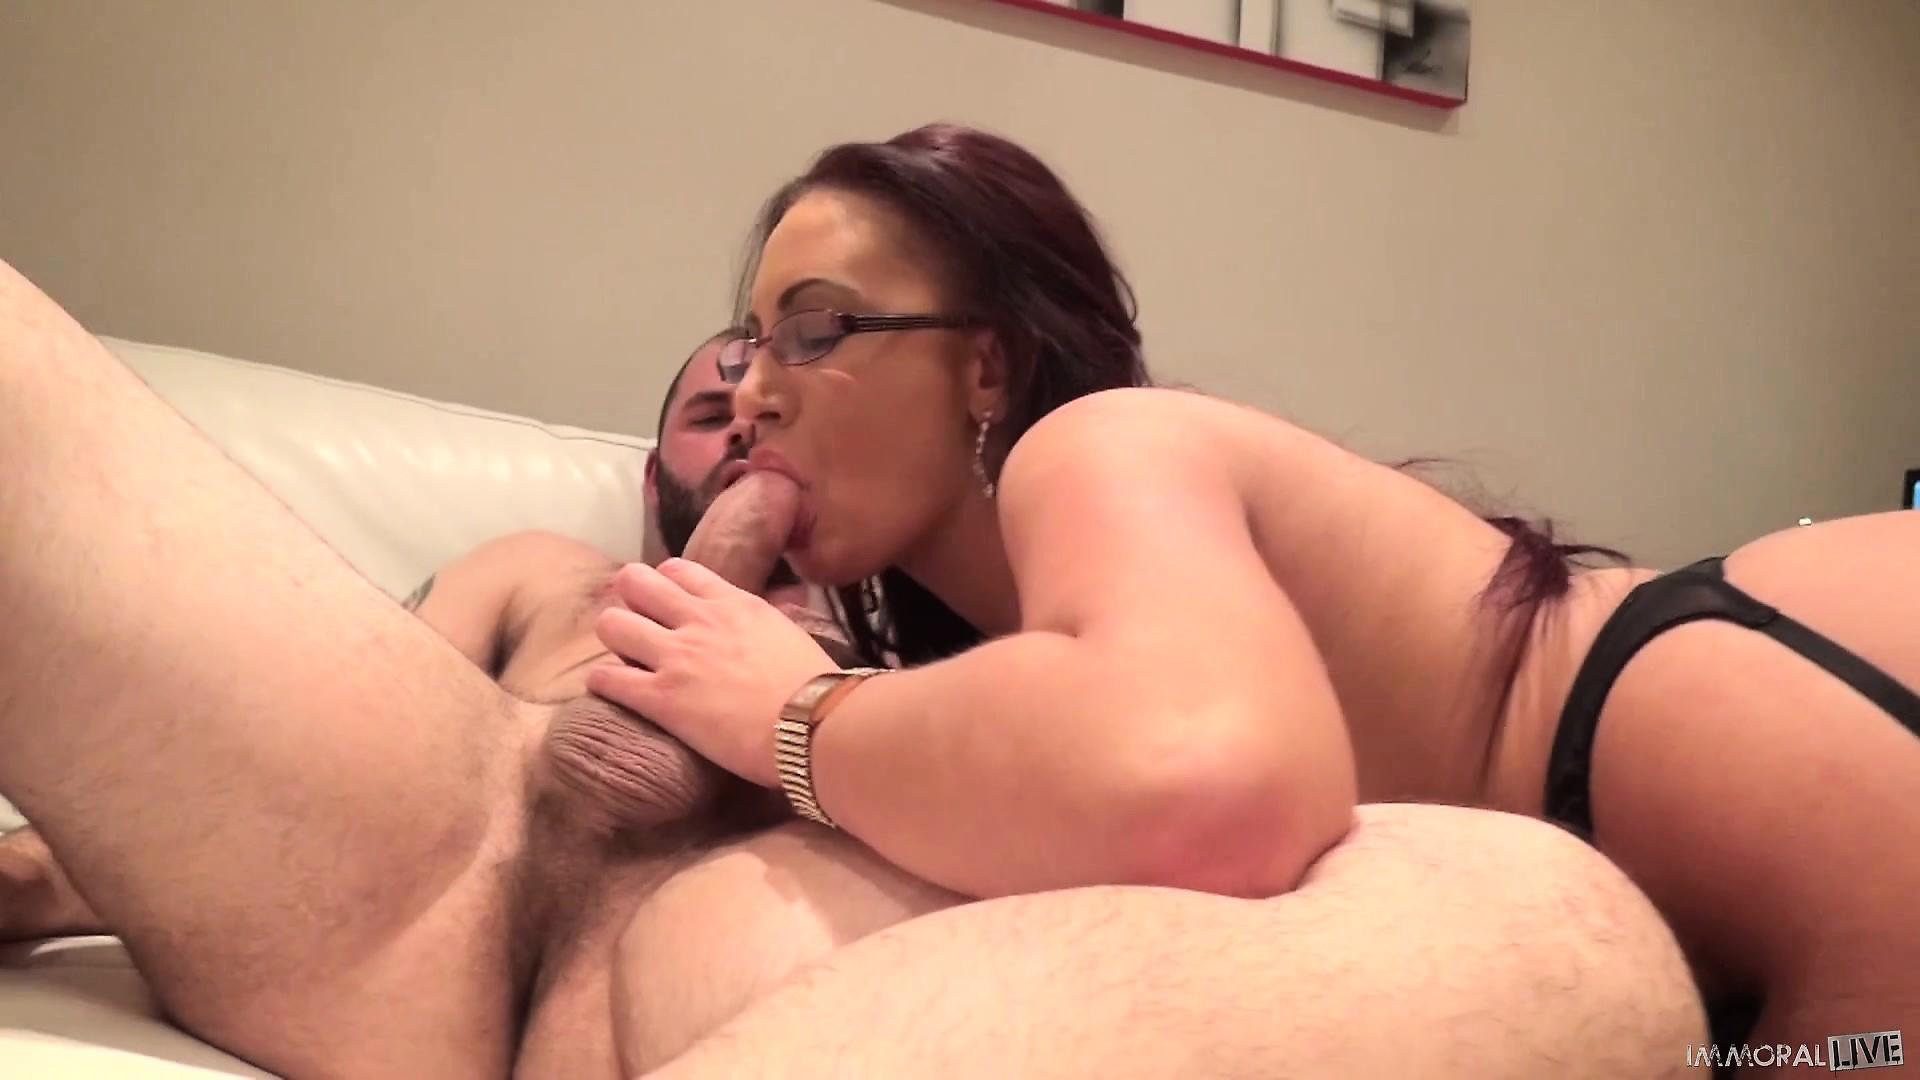 Sex vidieo english Big dick big anal